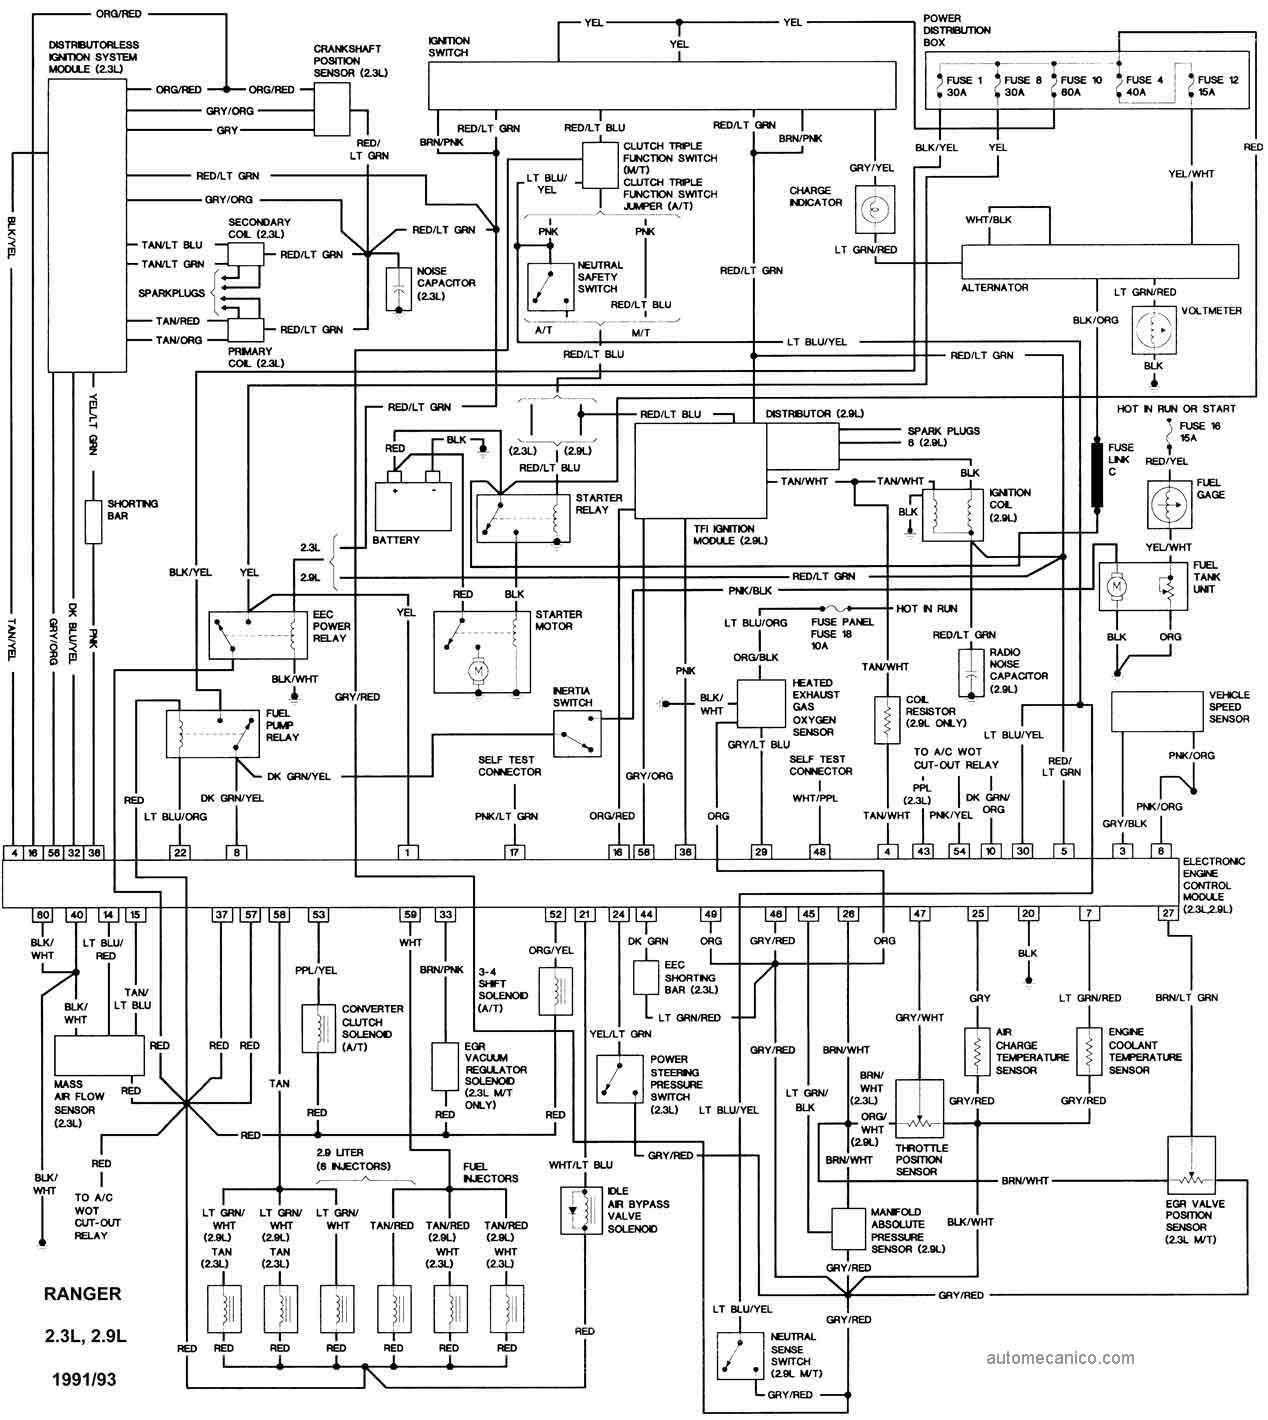 2005 Mazda Tribute Engine Diagram Wiring Library Schematic